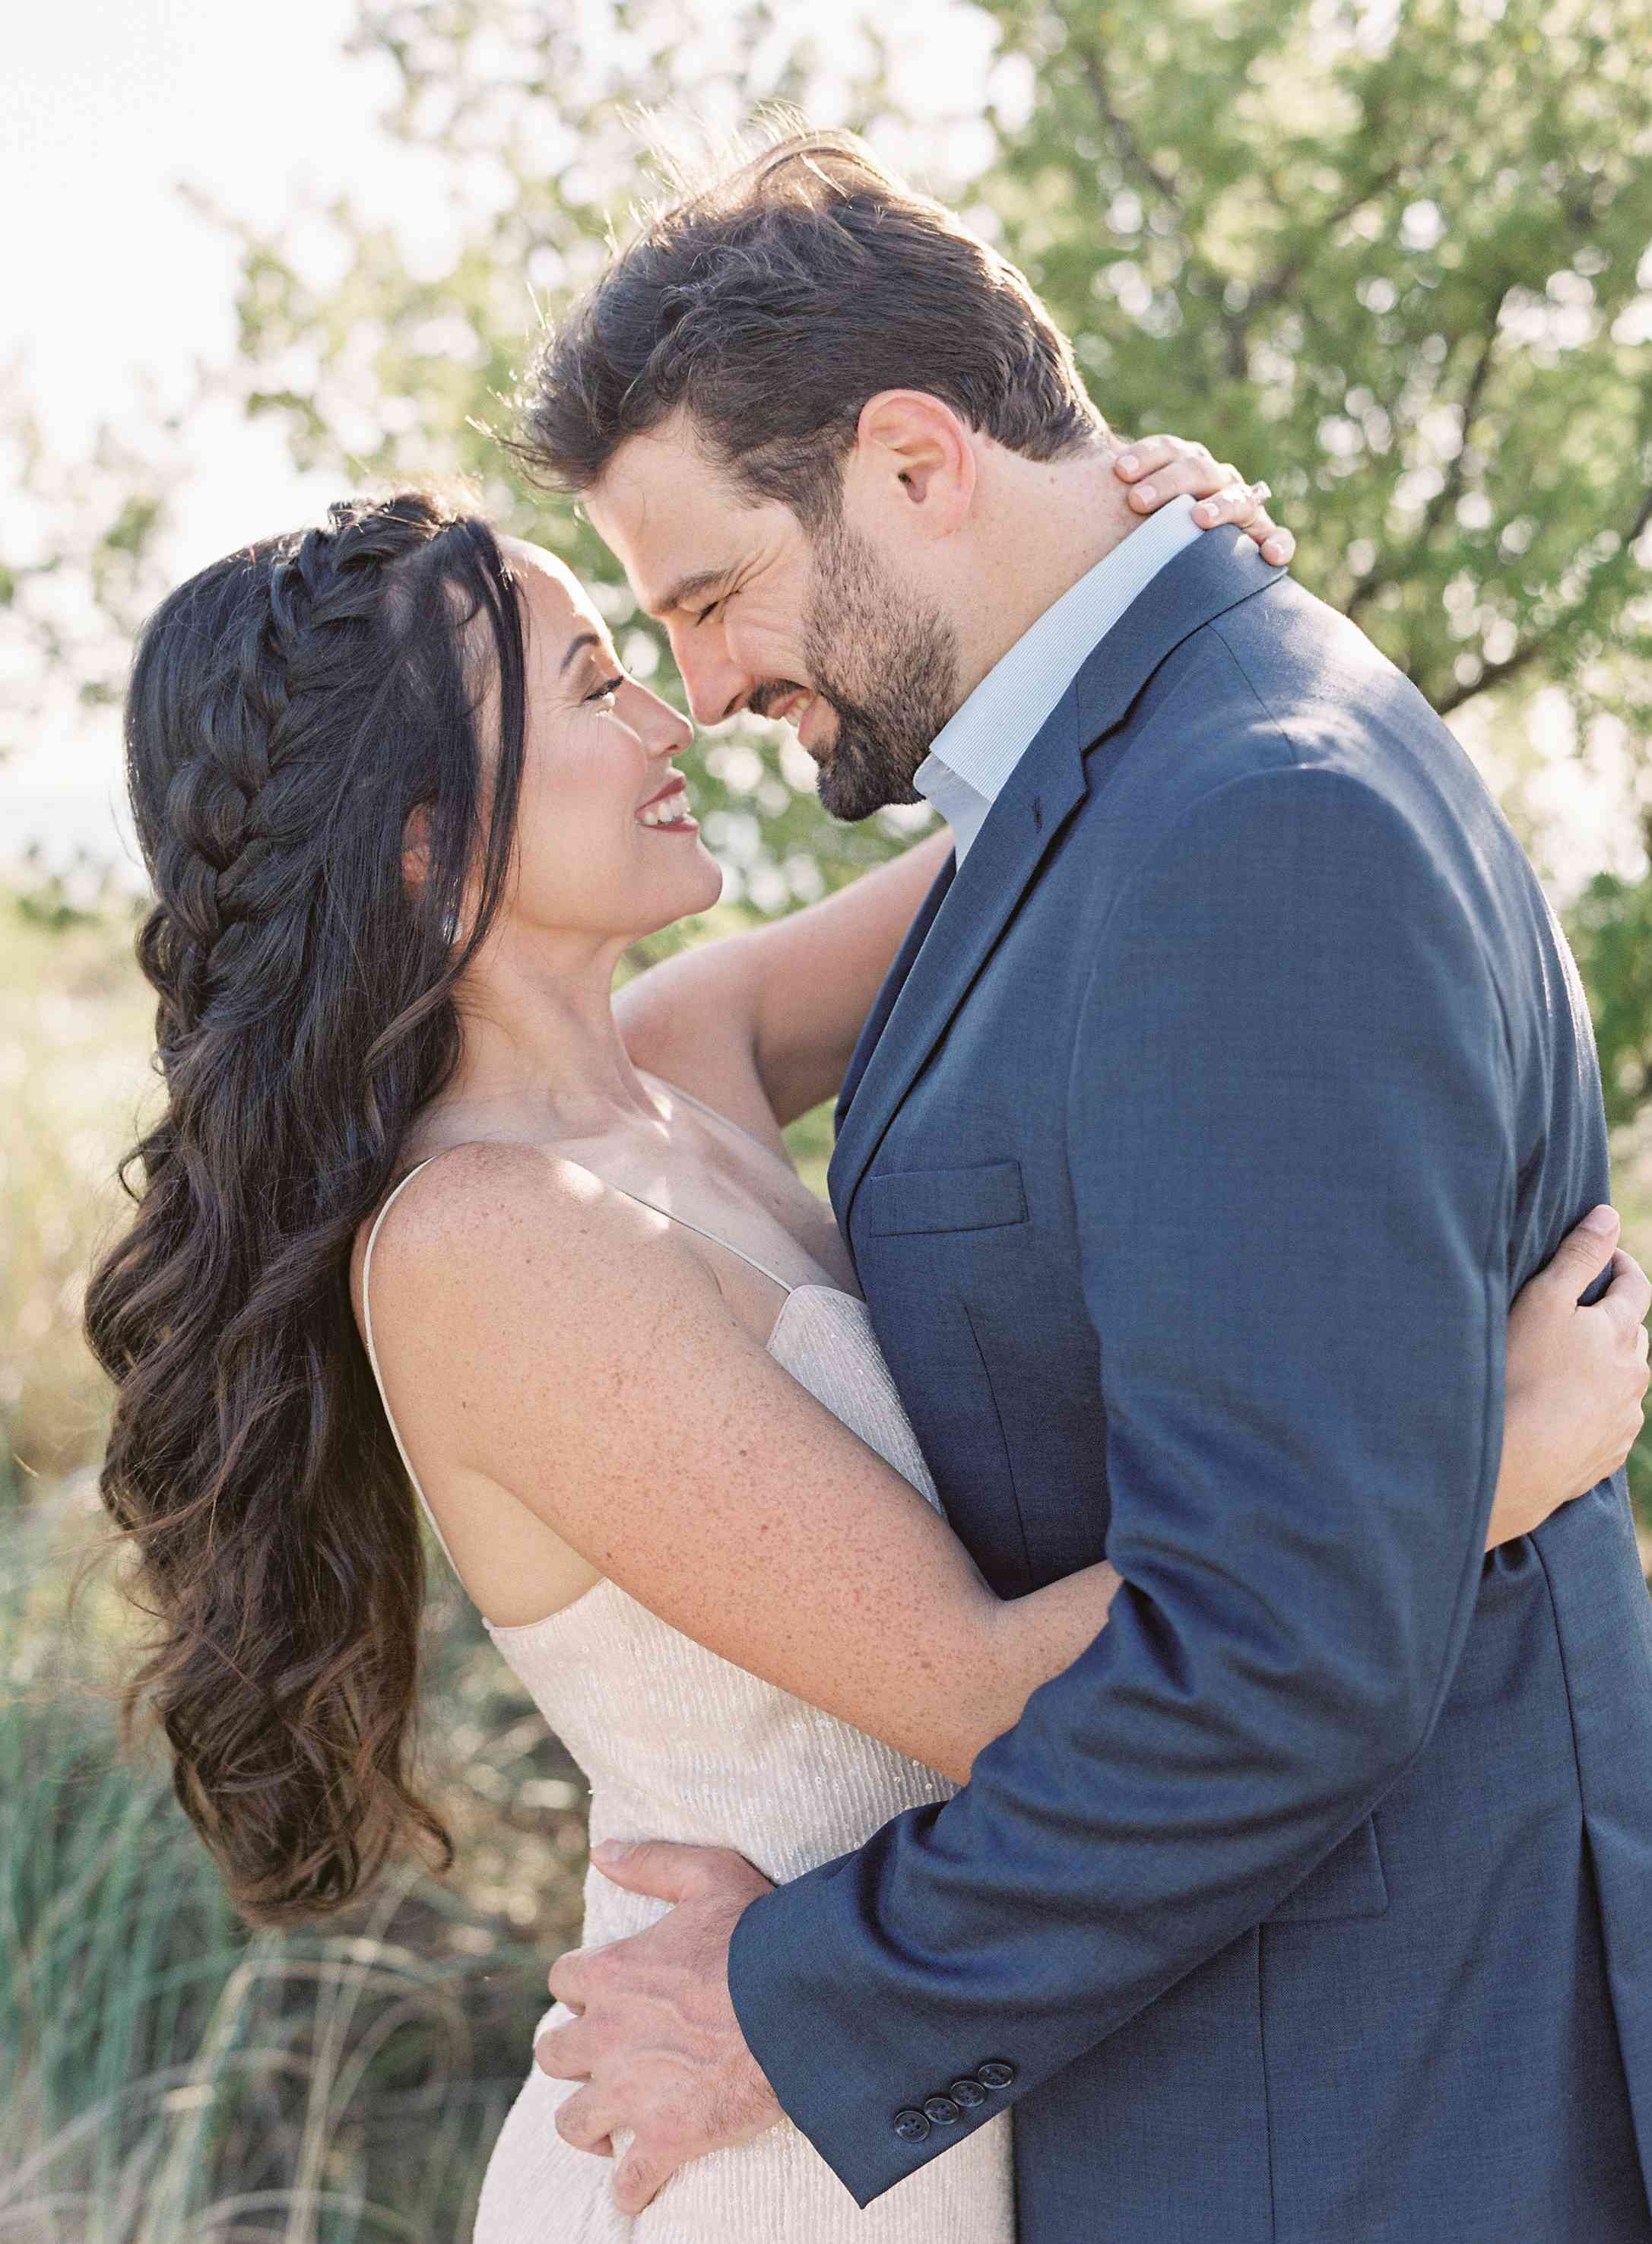 Bride with waterfall braid embracing groom